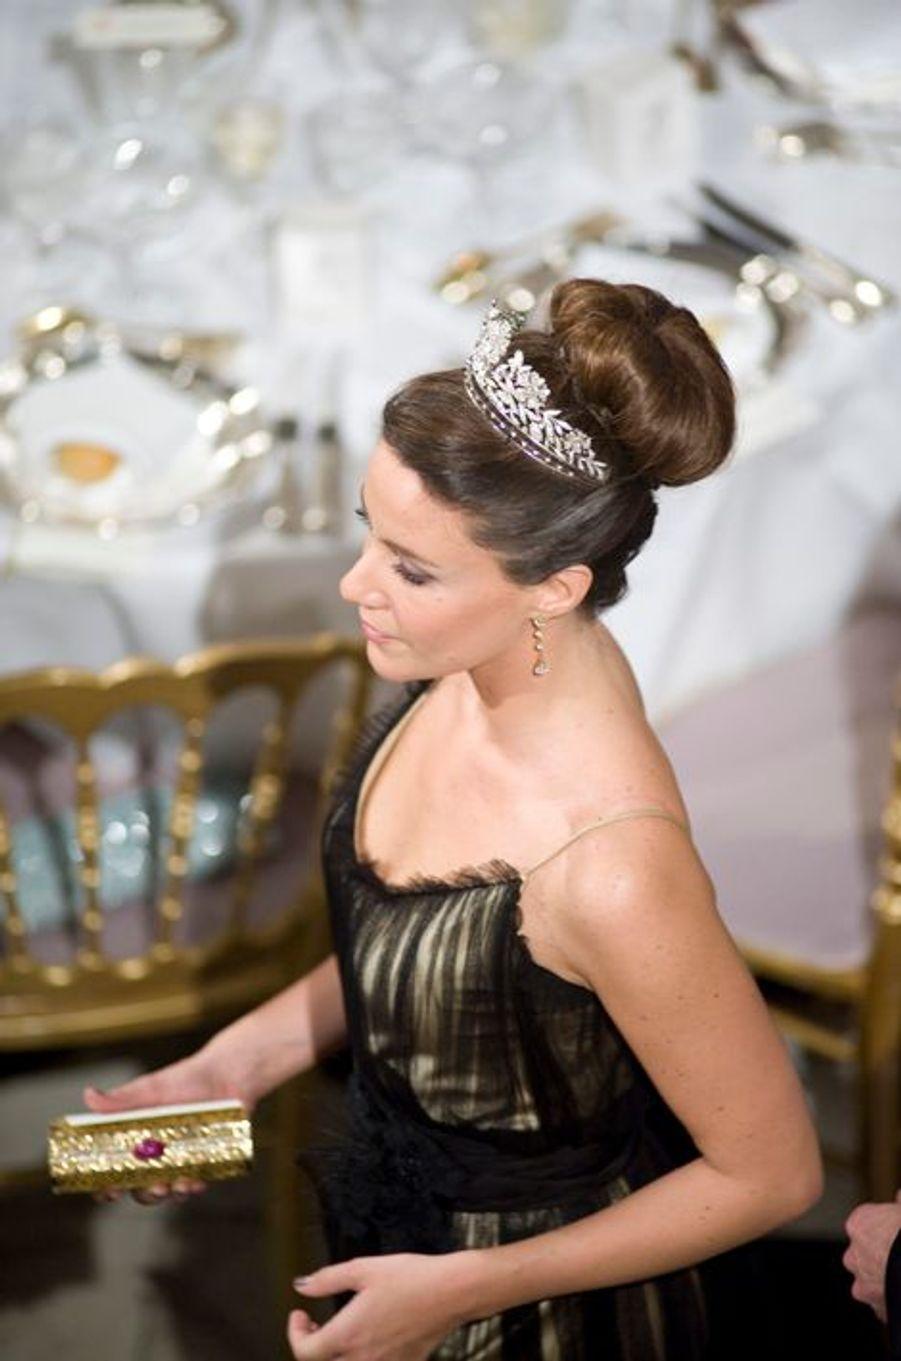 La princesse Marie de Danemark, le 16 avril 2010